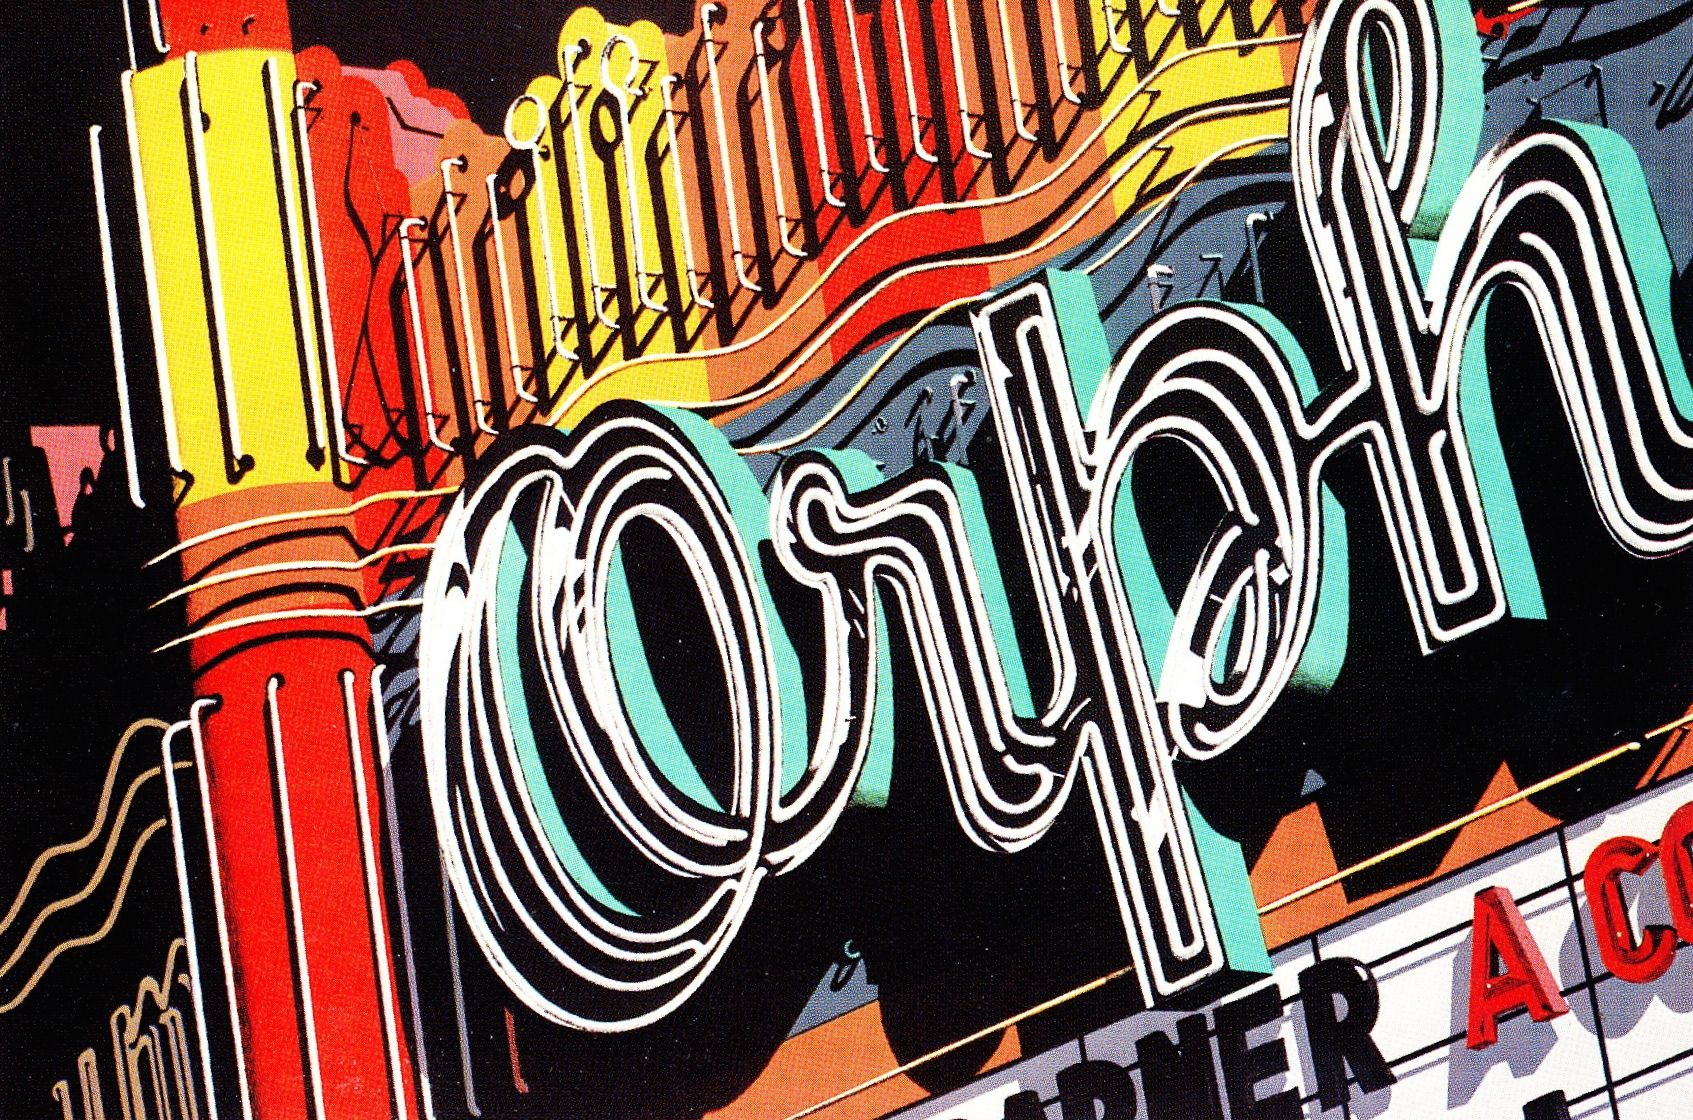 Robert Cottingham, Orph, color lithograph,1972 Artwork